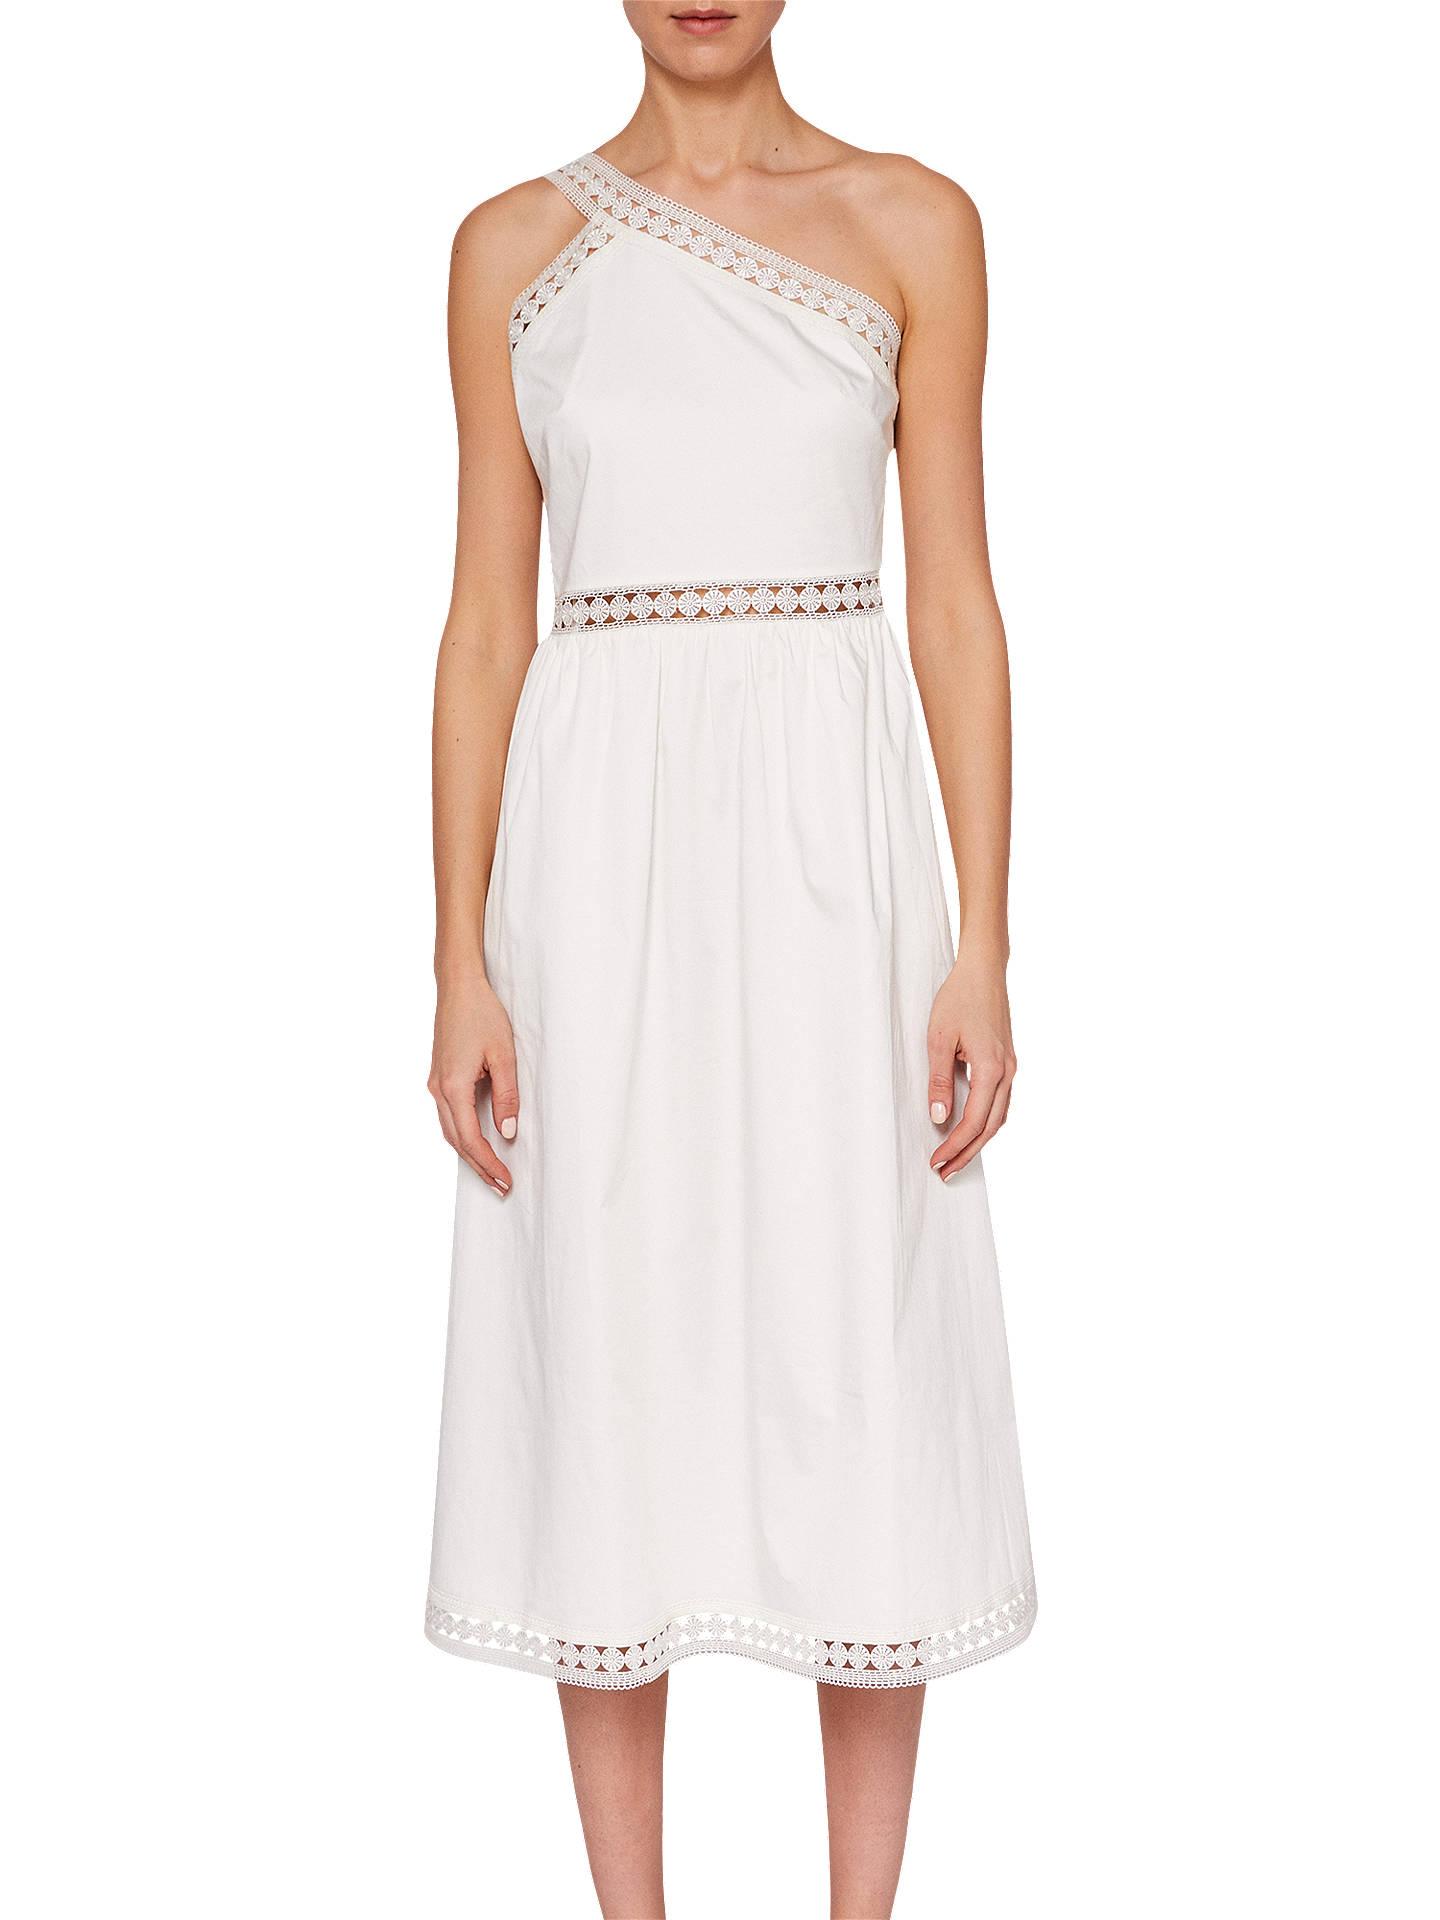 3480e994f Ted Baker Cottoned On Kallii Asymmetric Cotton Dress at John Lewis ...